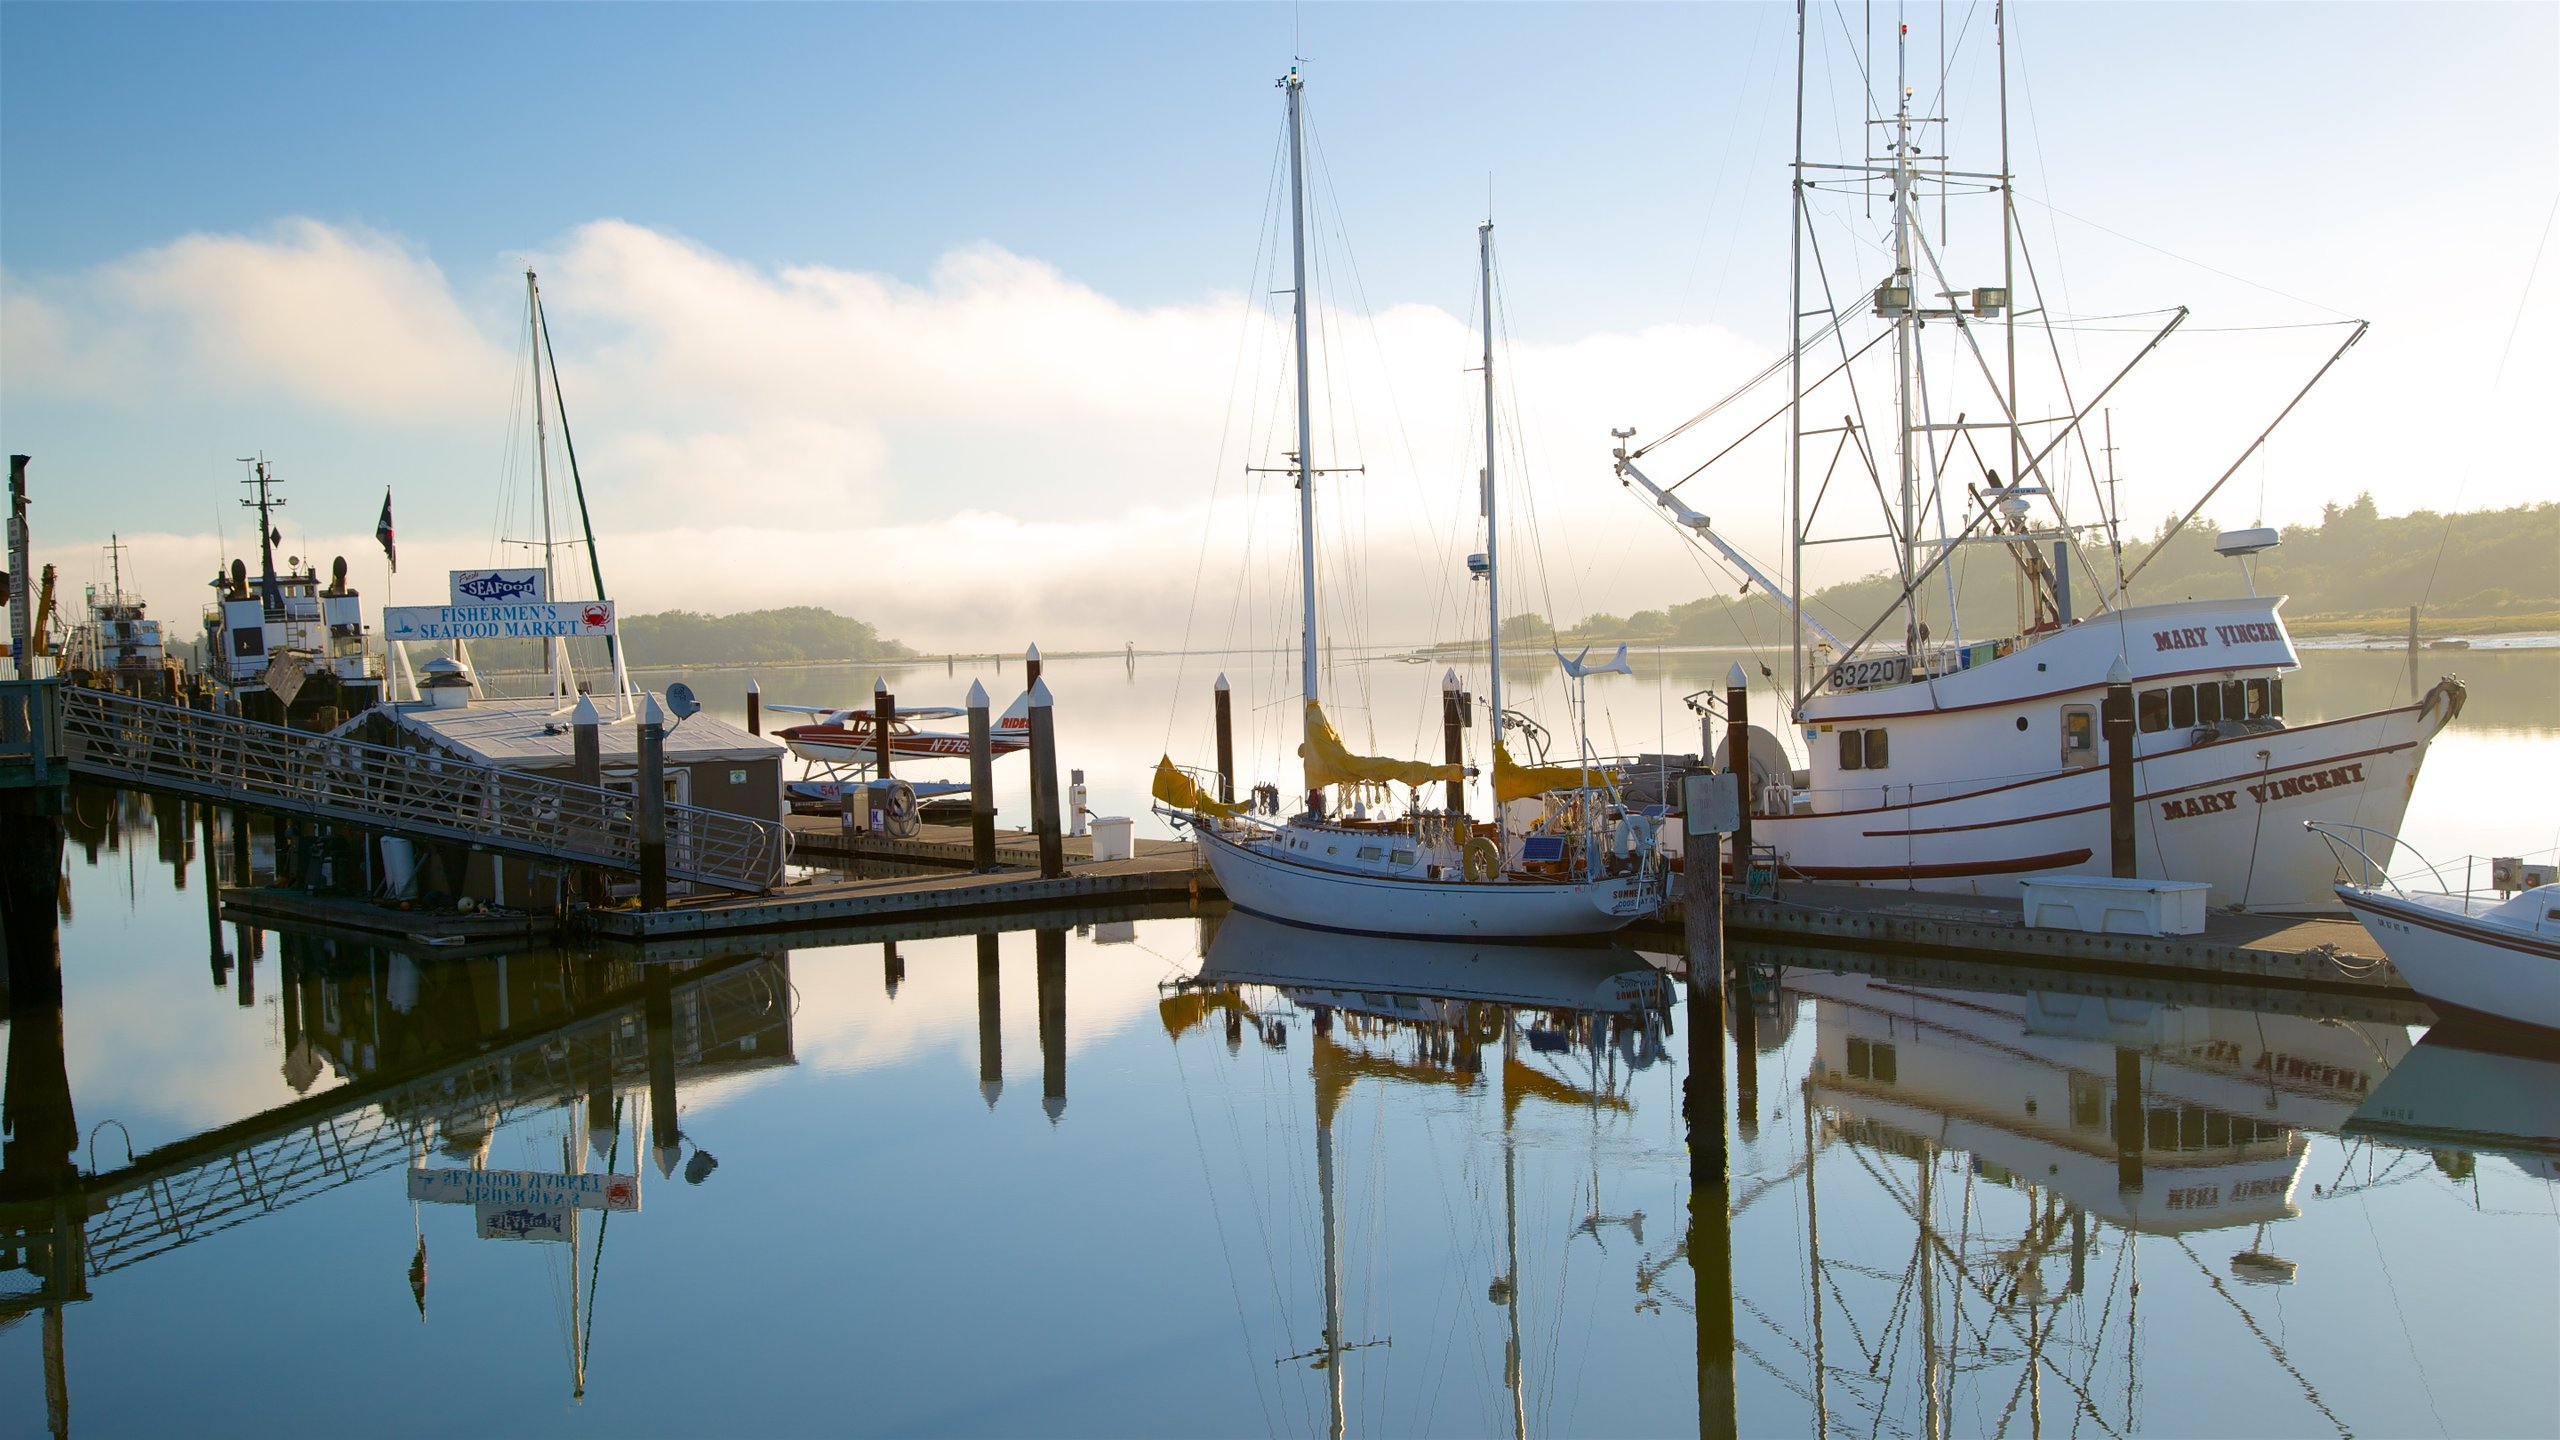 Coos Bay, Oregon, United States of America